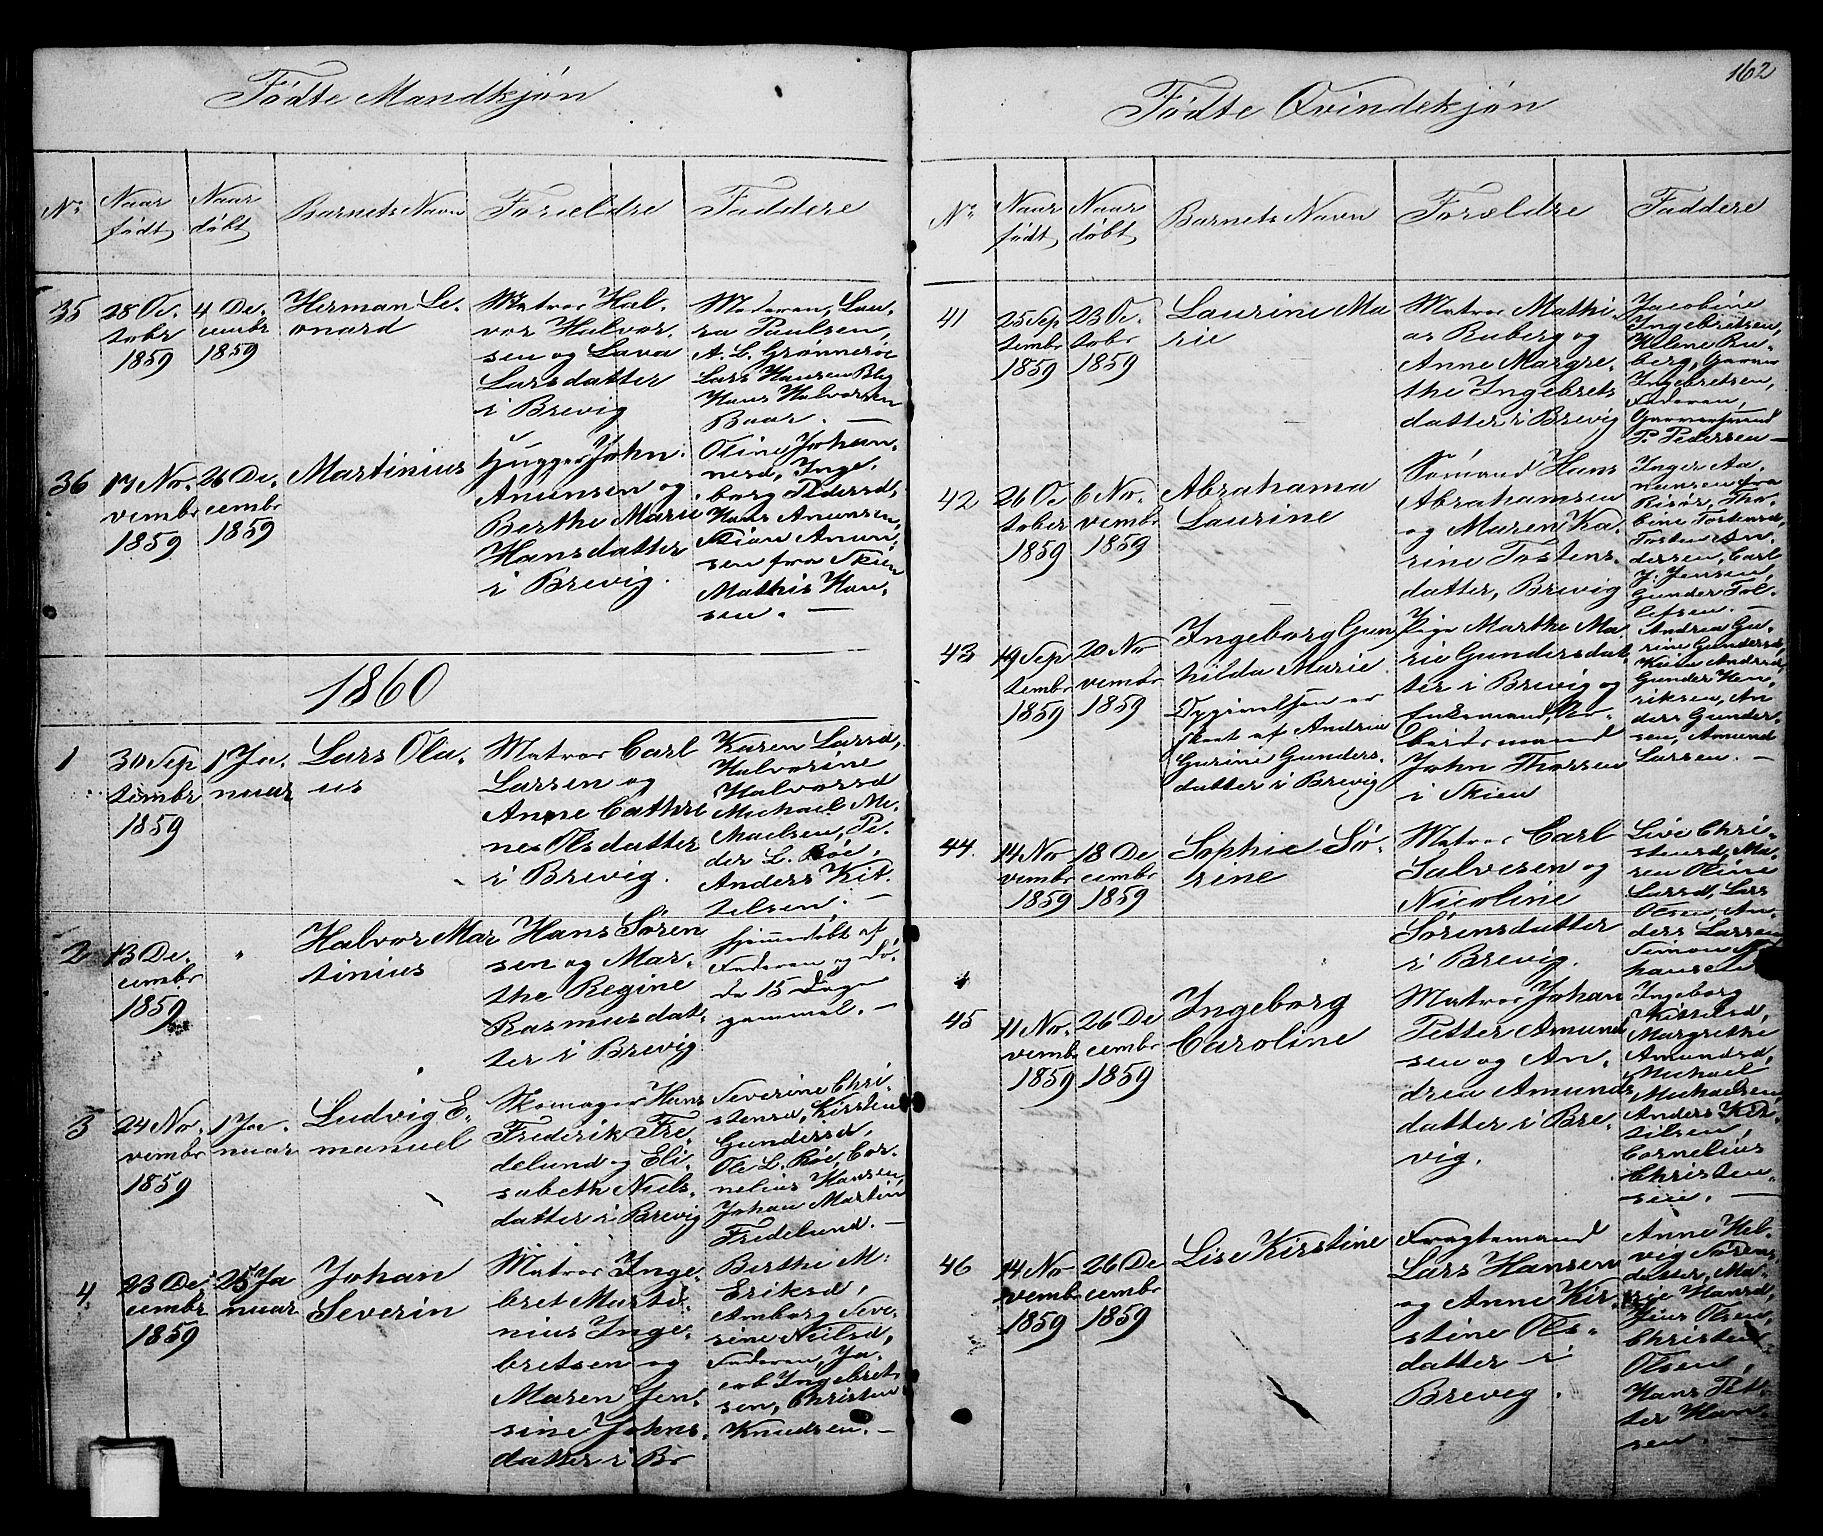 SAKO, Brevik kirkebøker, G/Ga/L0002: Klokkerbok nr. 2, 1846-1865, s. 162